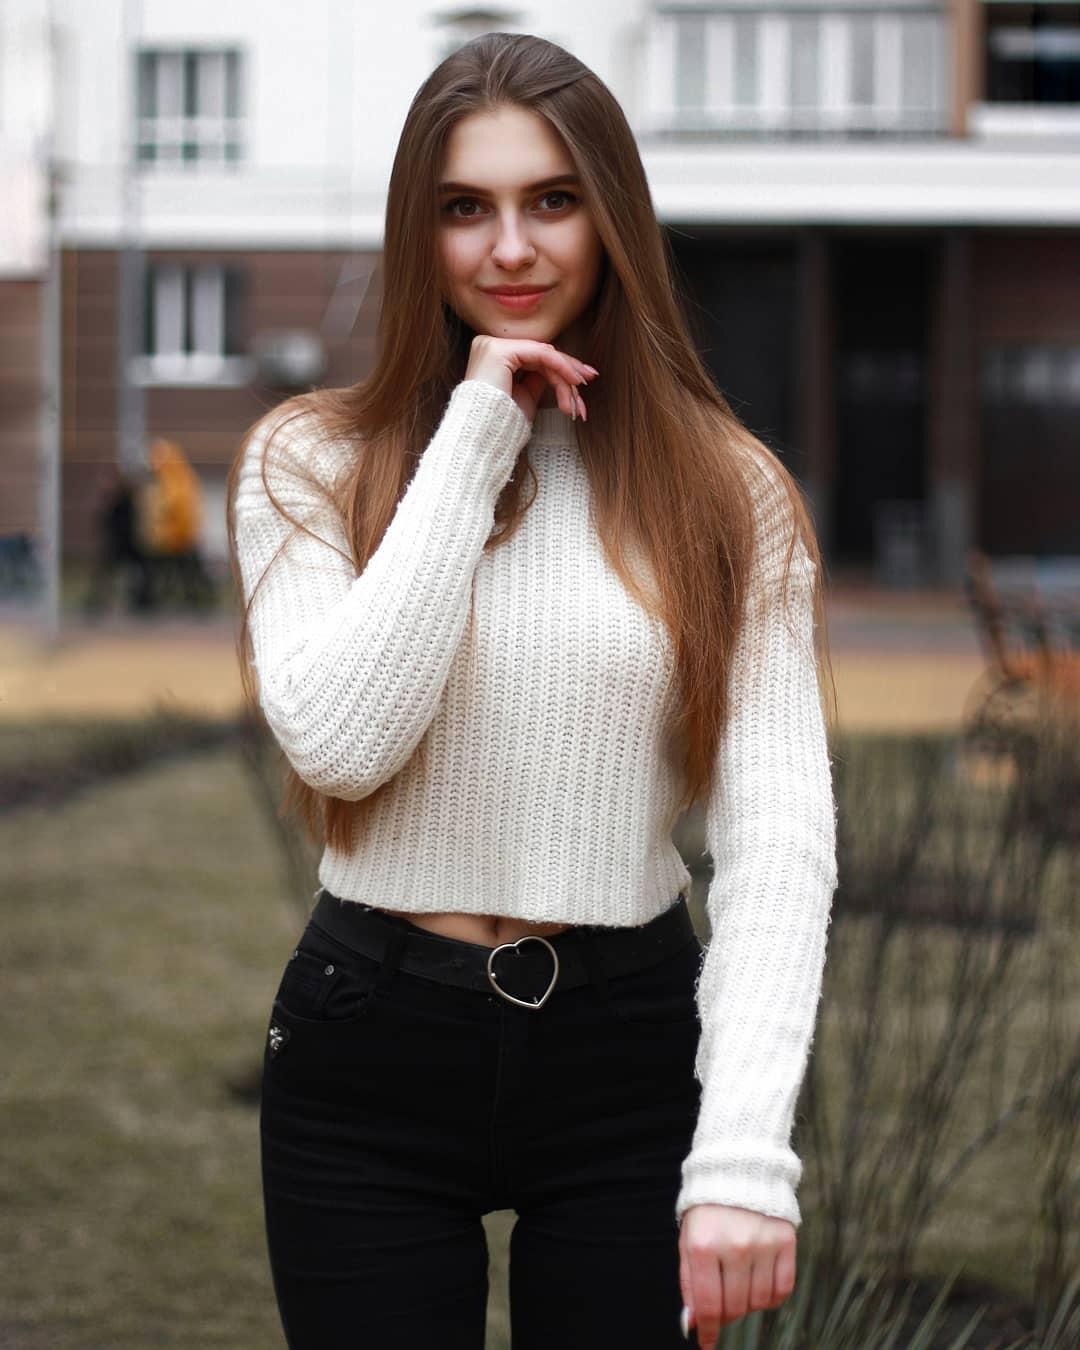 Katya-Melnyk-Wallpapers-Insta-Biography-8